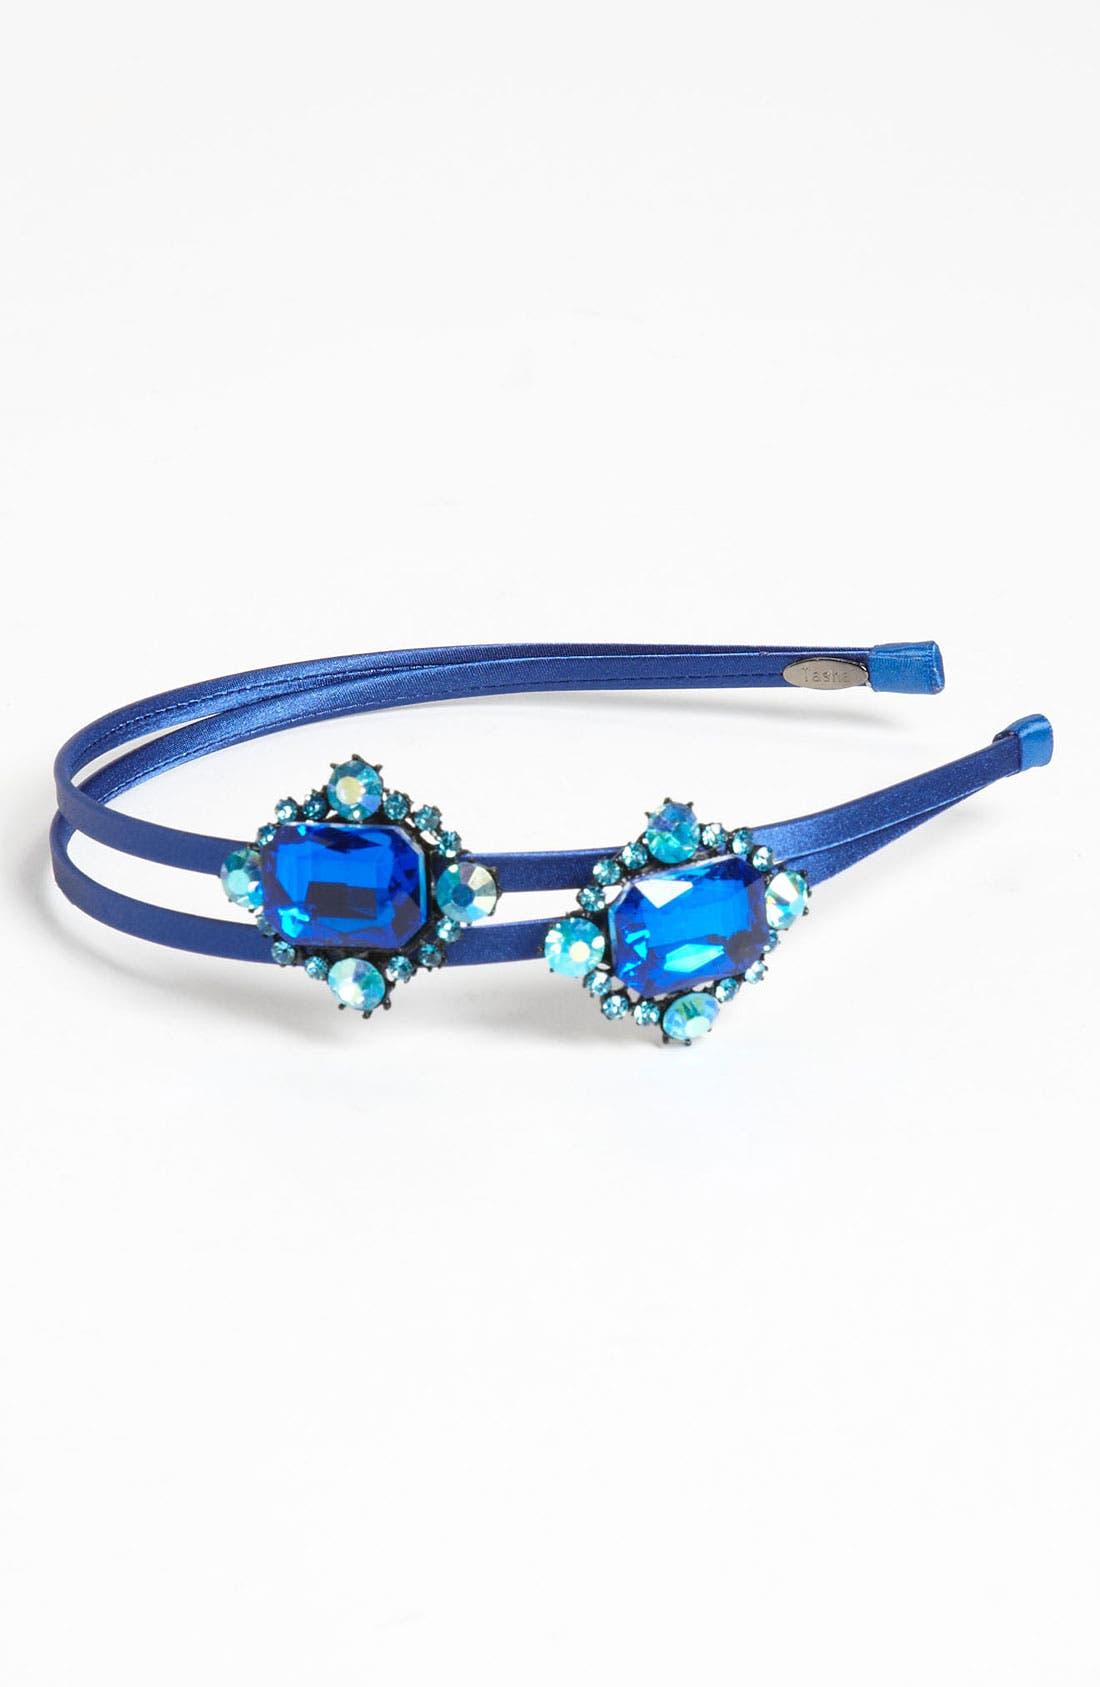 Main Image - Tasha 'Gems & Jewels' Headband